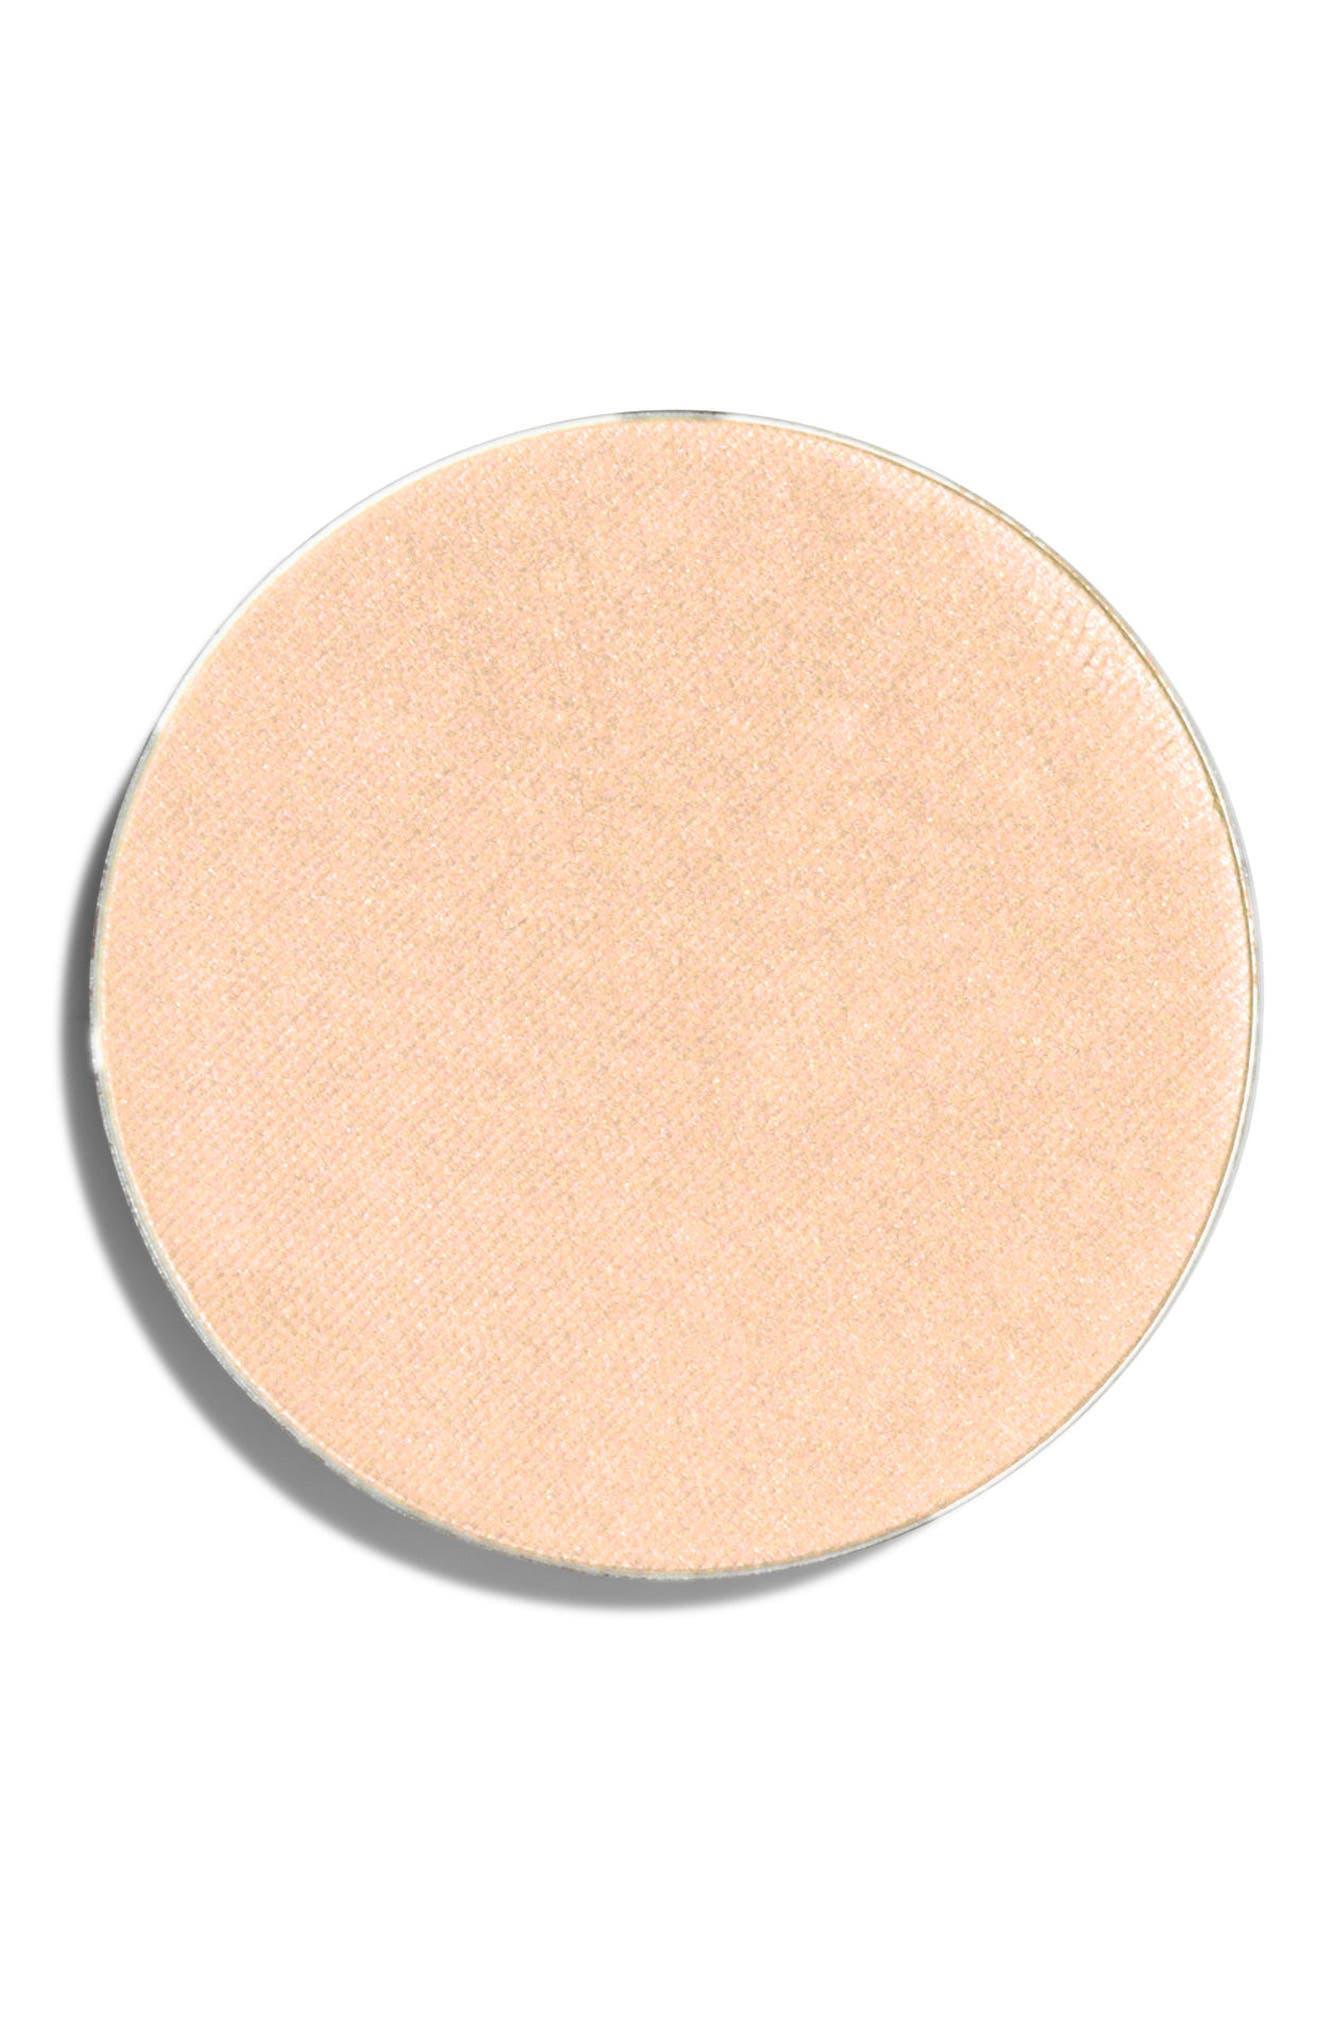 CHANTECAILLE, Lasting Eye Shade Refill, Main thumbnail 1, color, OPAL